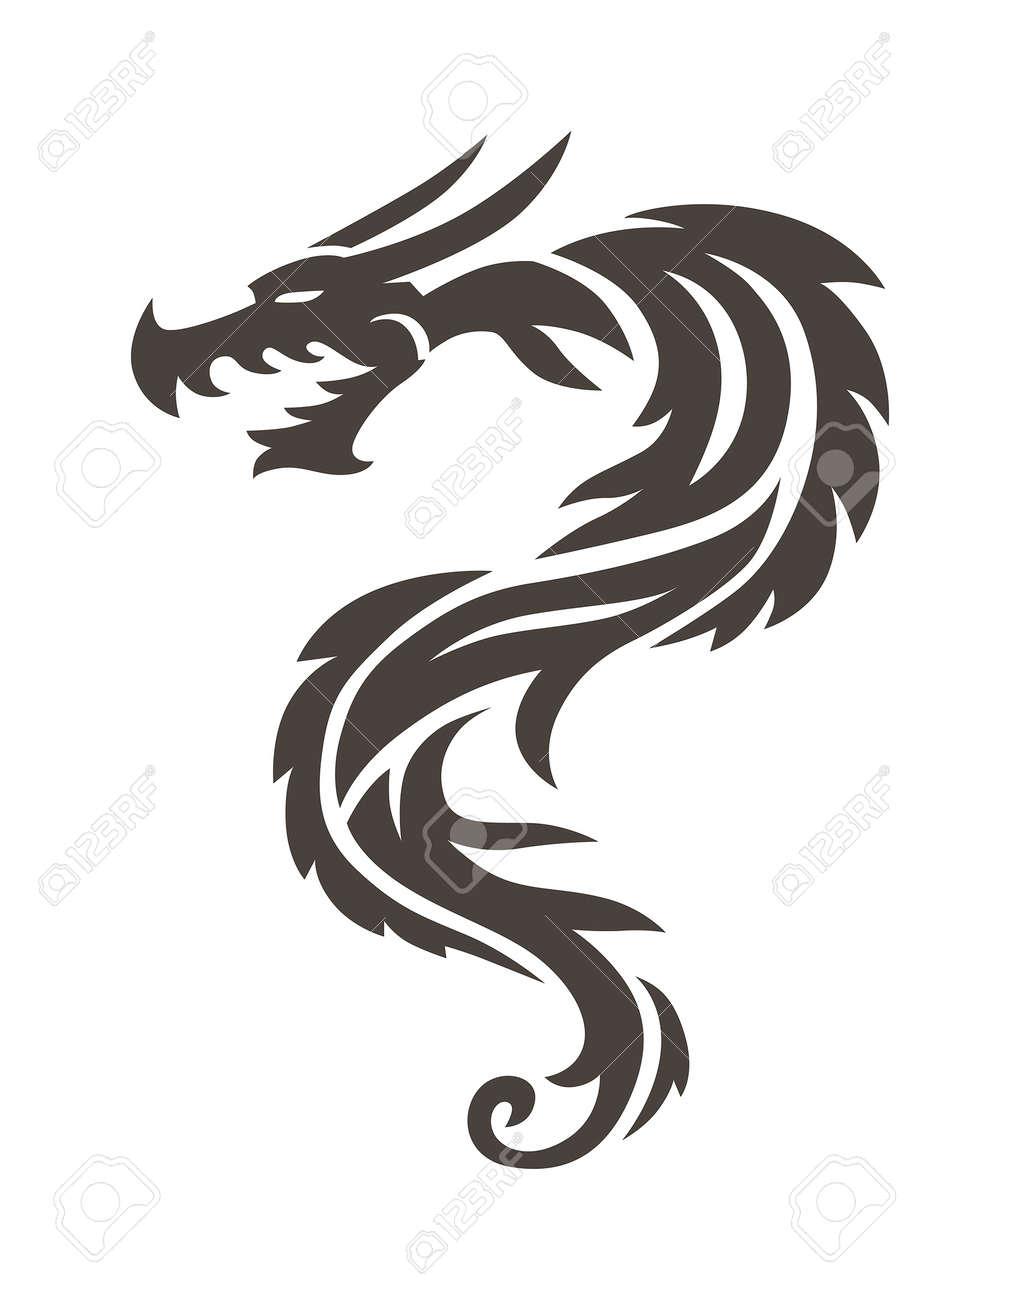 Tatuajes Faciles De Hacer De Dragones